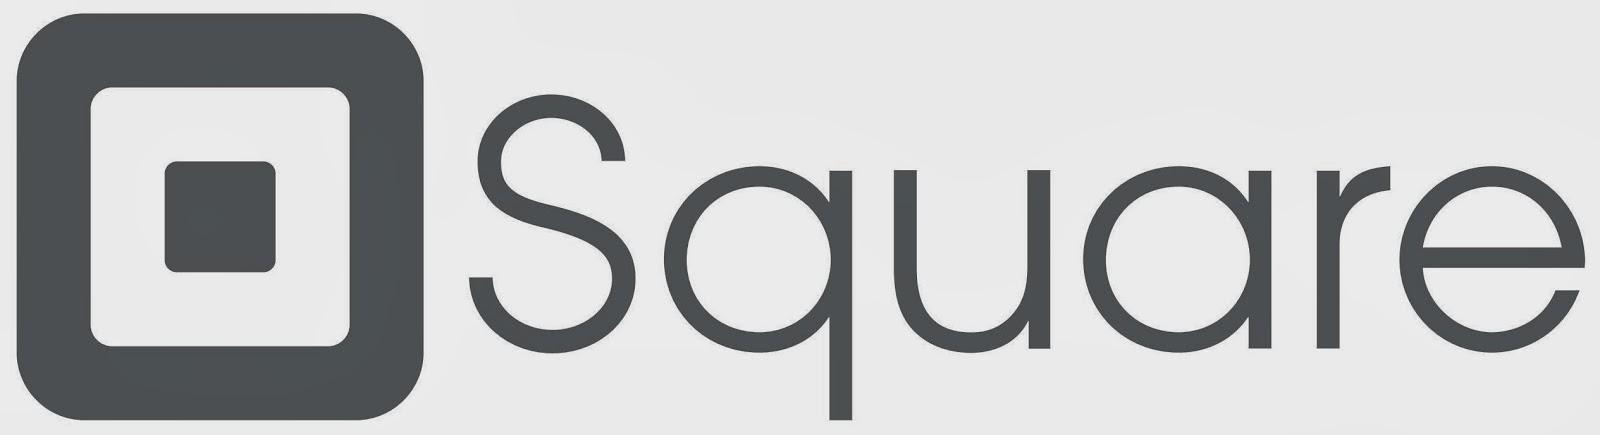 Square Logo (eps) Free Download - Welogo Vector